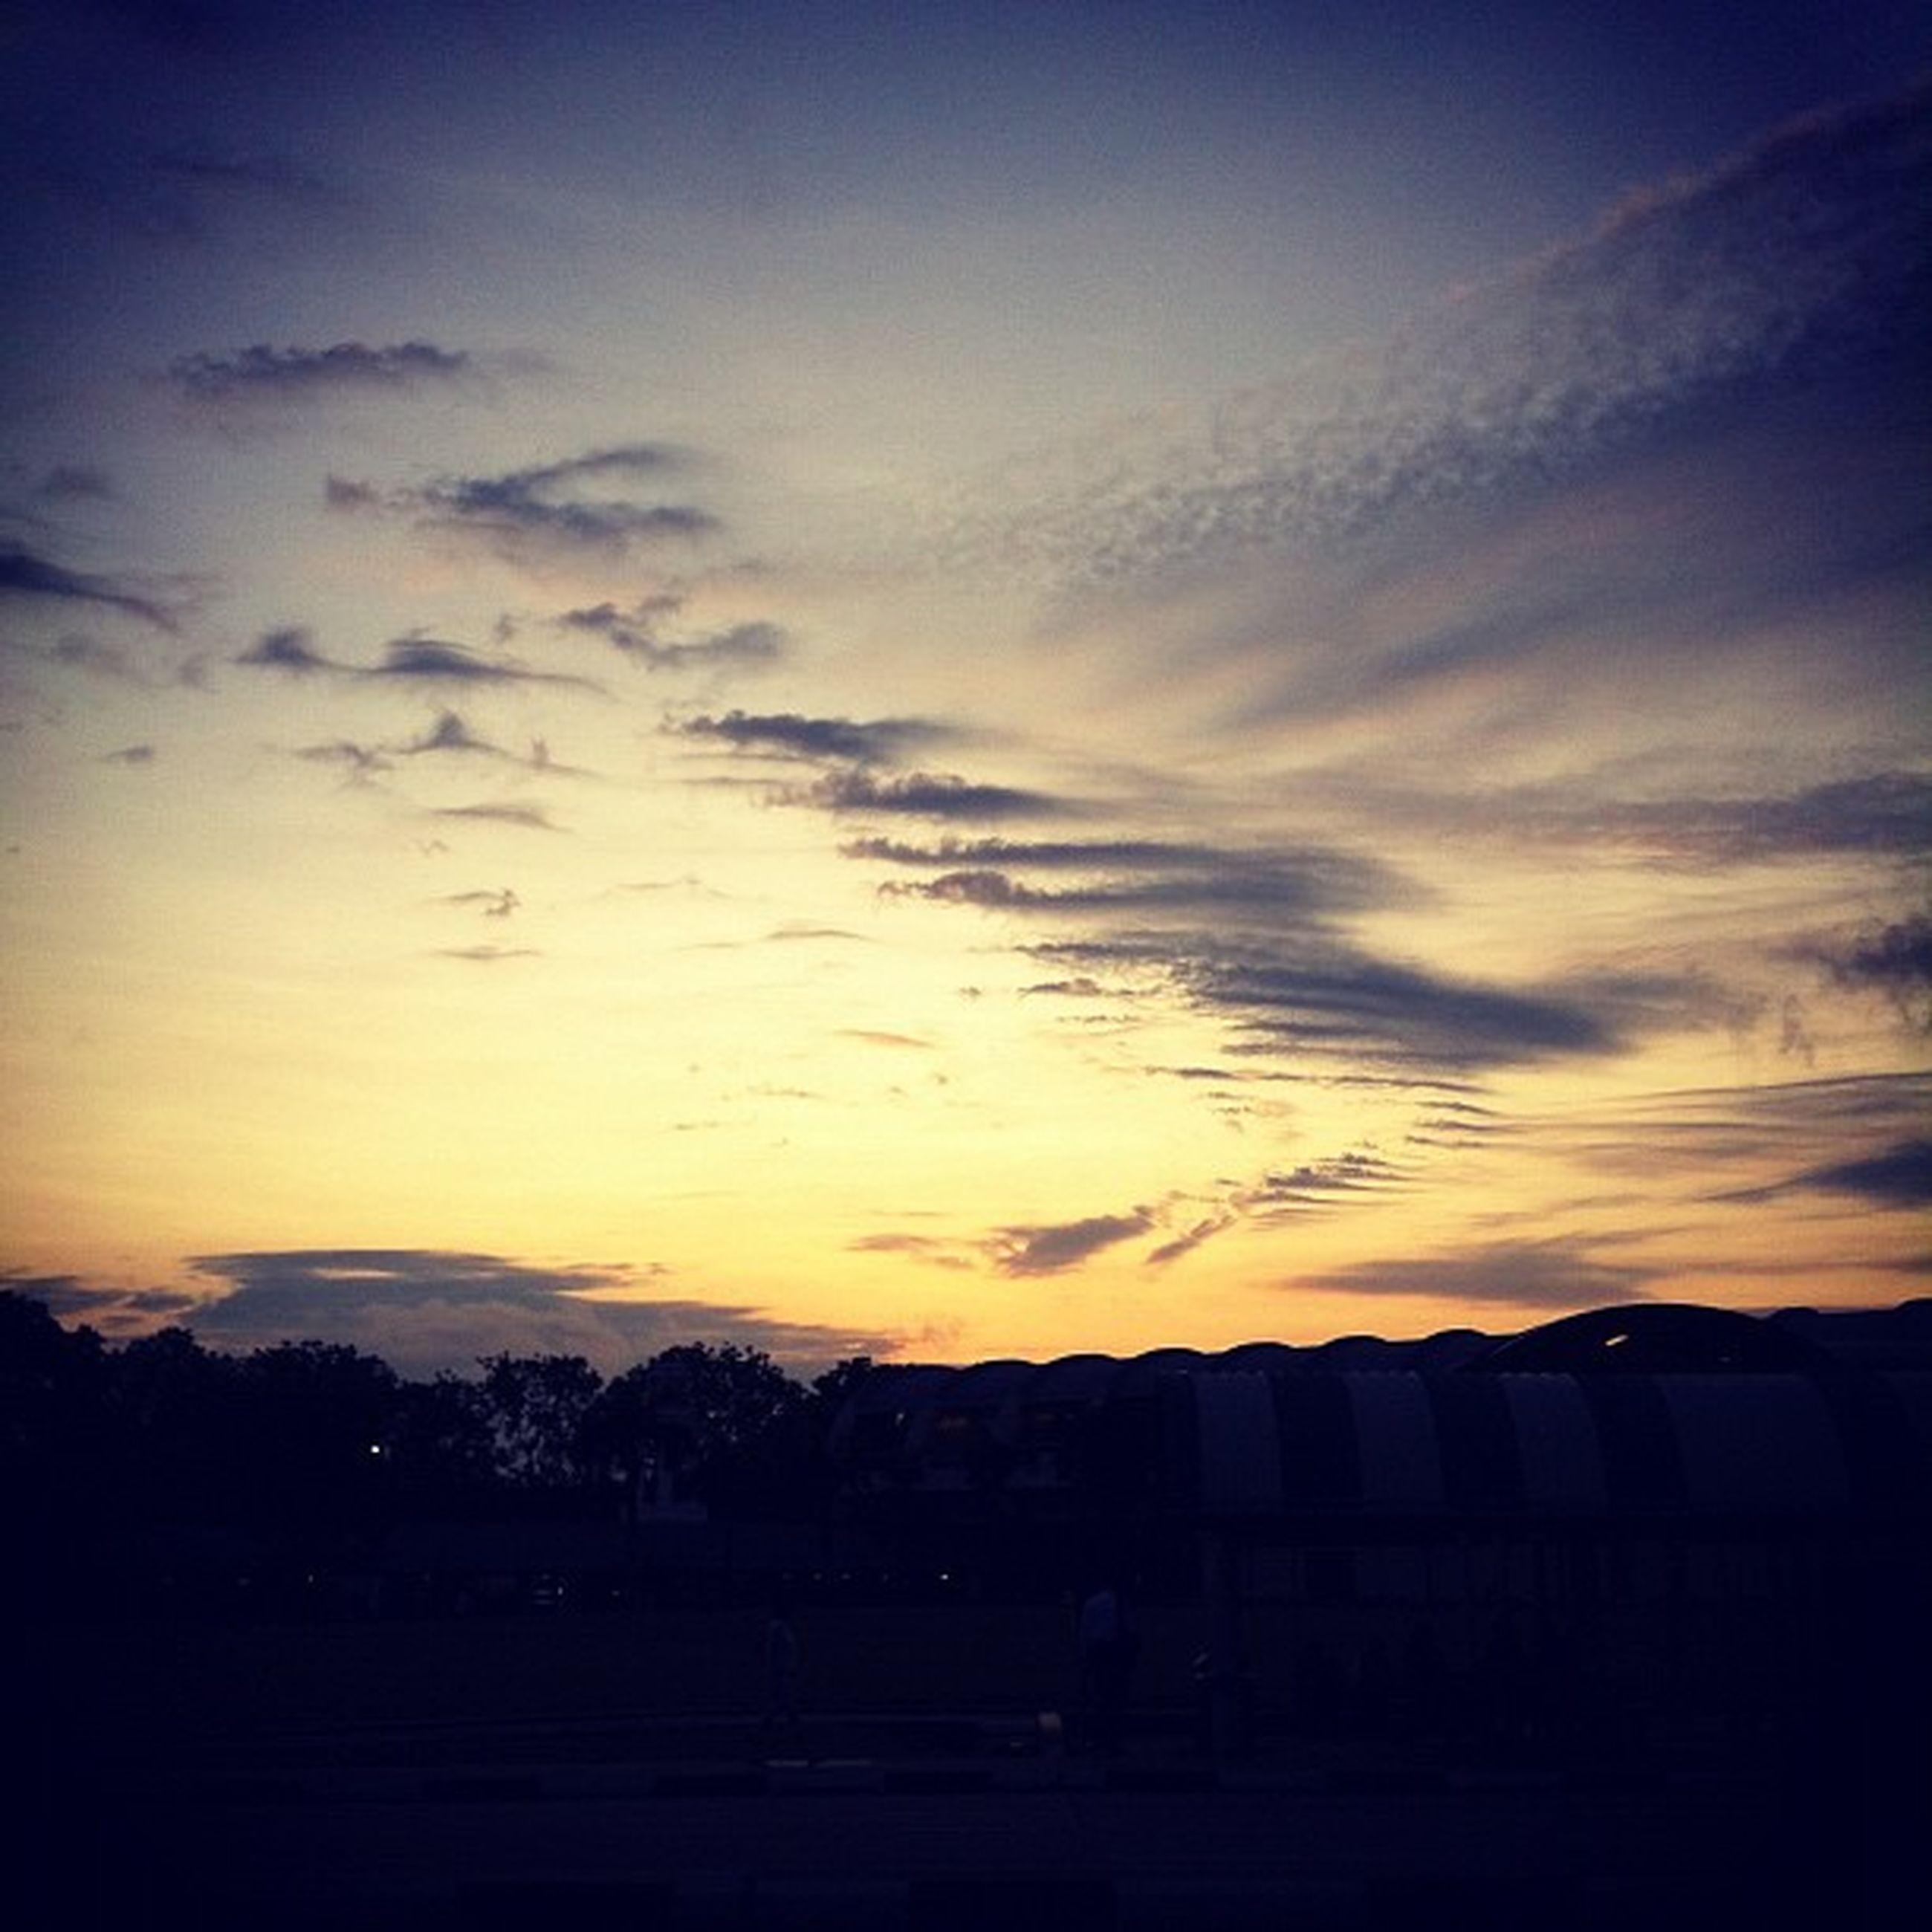 sunset, silhouette, sky, scenics, tranquil scene, tranquility, beauty in nature, landscape, cloud - sky, nature, orange color, idyllic, cloud, dramatic sky, dark, dusk, outdoors, field, no people, moody sky